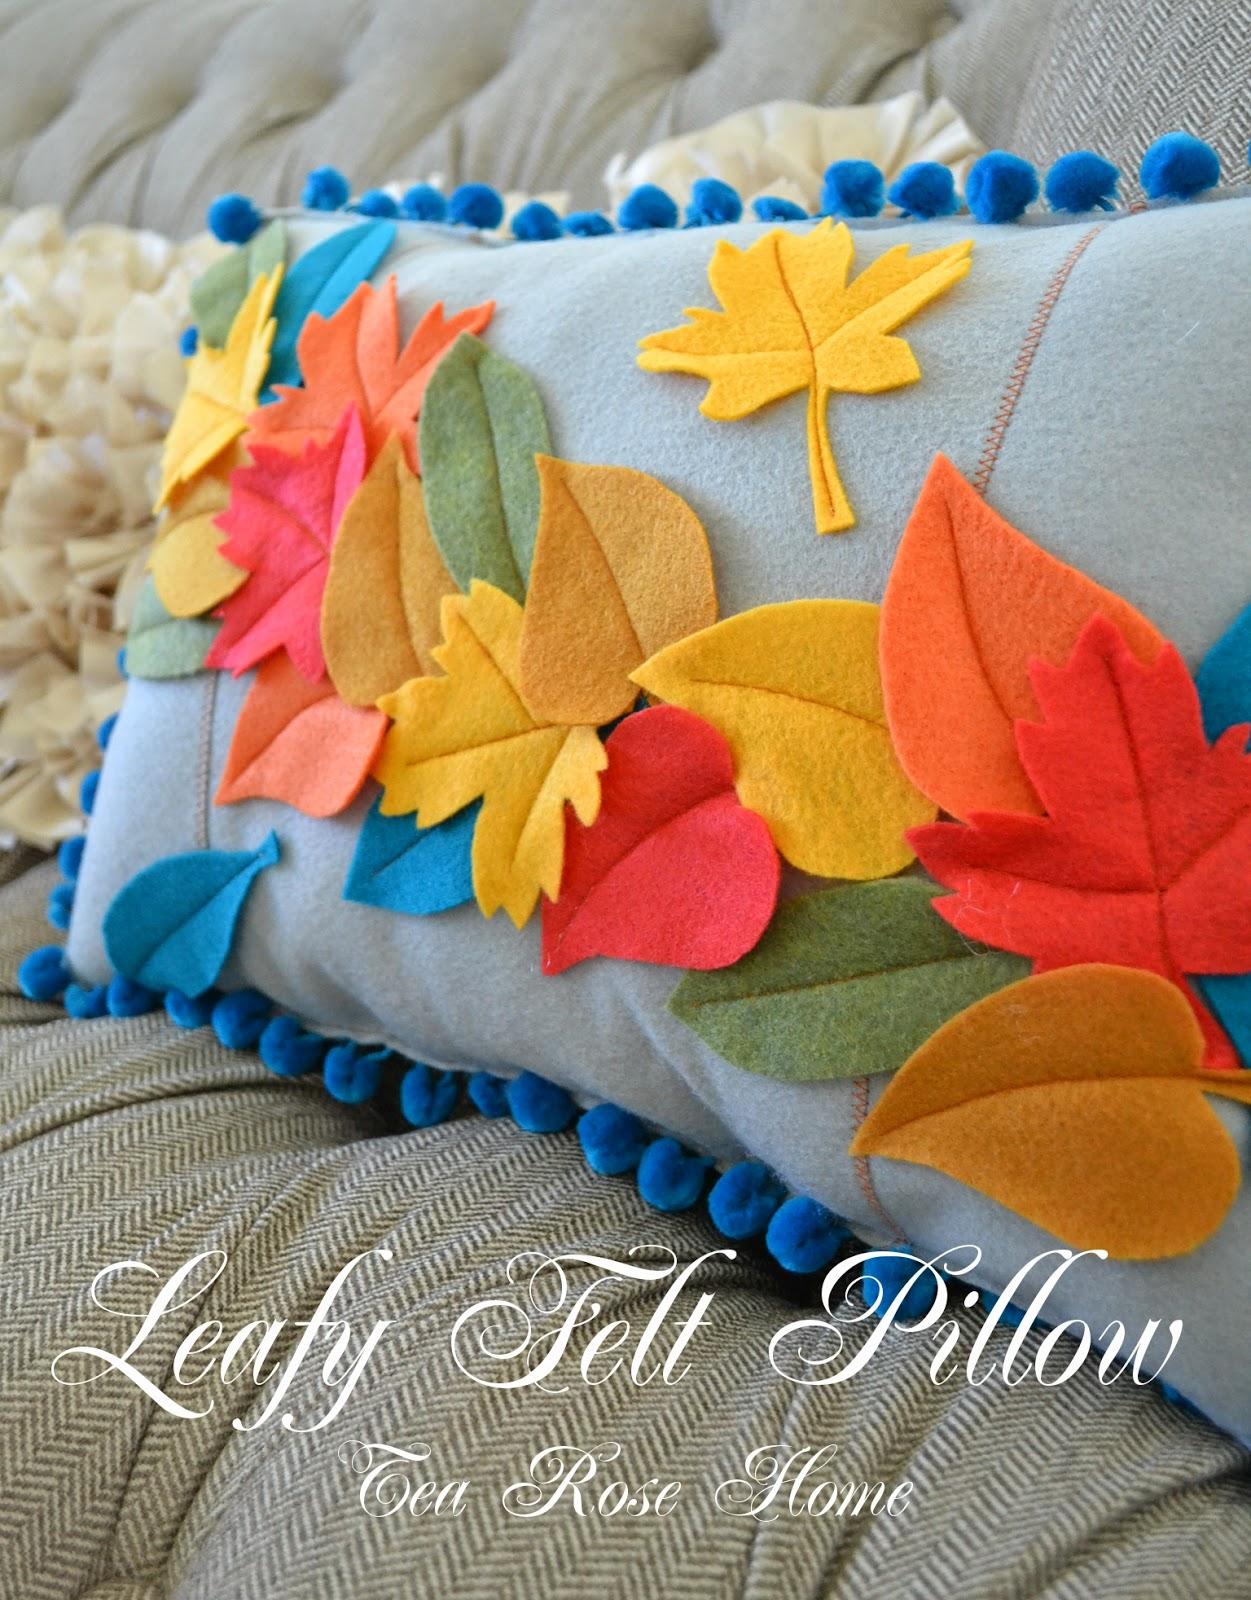 Tea rose home tutorial leafy felt pillow - Cojines hechos a mano ...